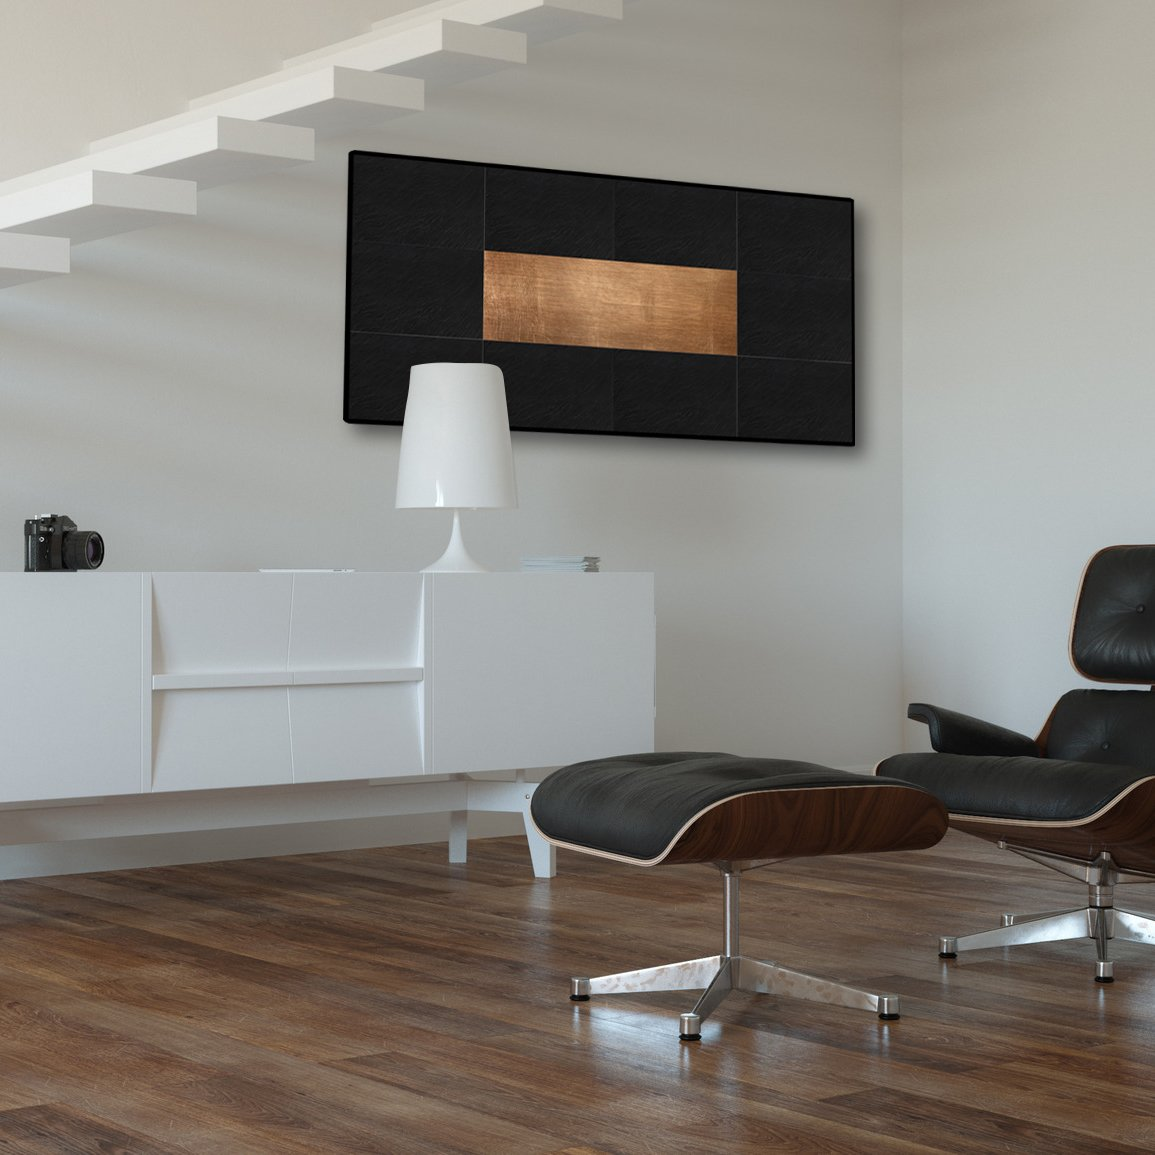 Pannelli radianti arredo thermosaic - Riscaldamento pannelli radianti a parete ...